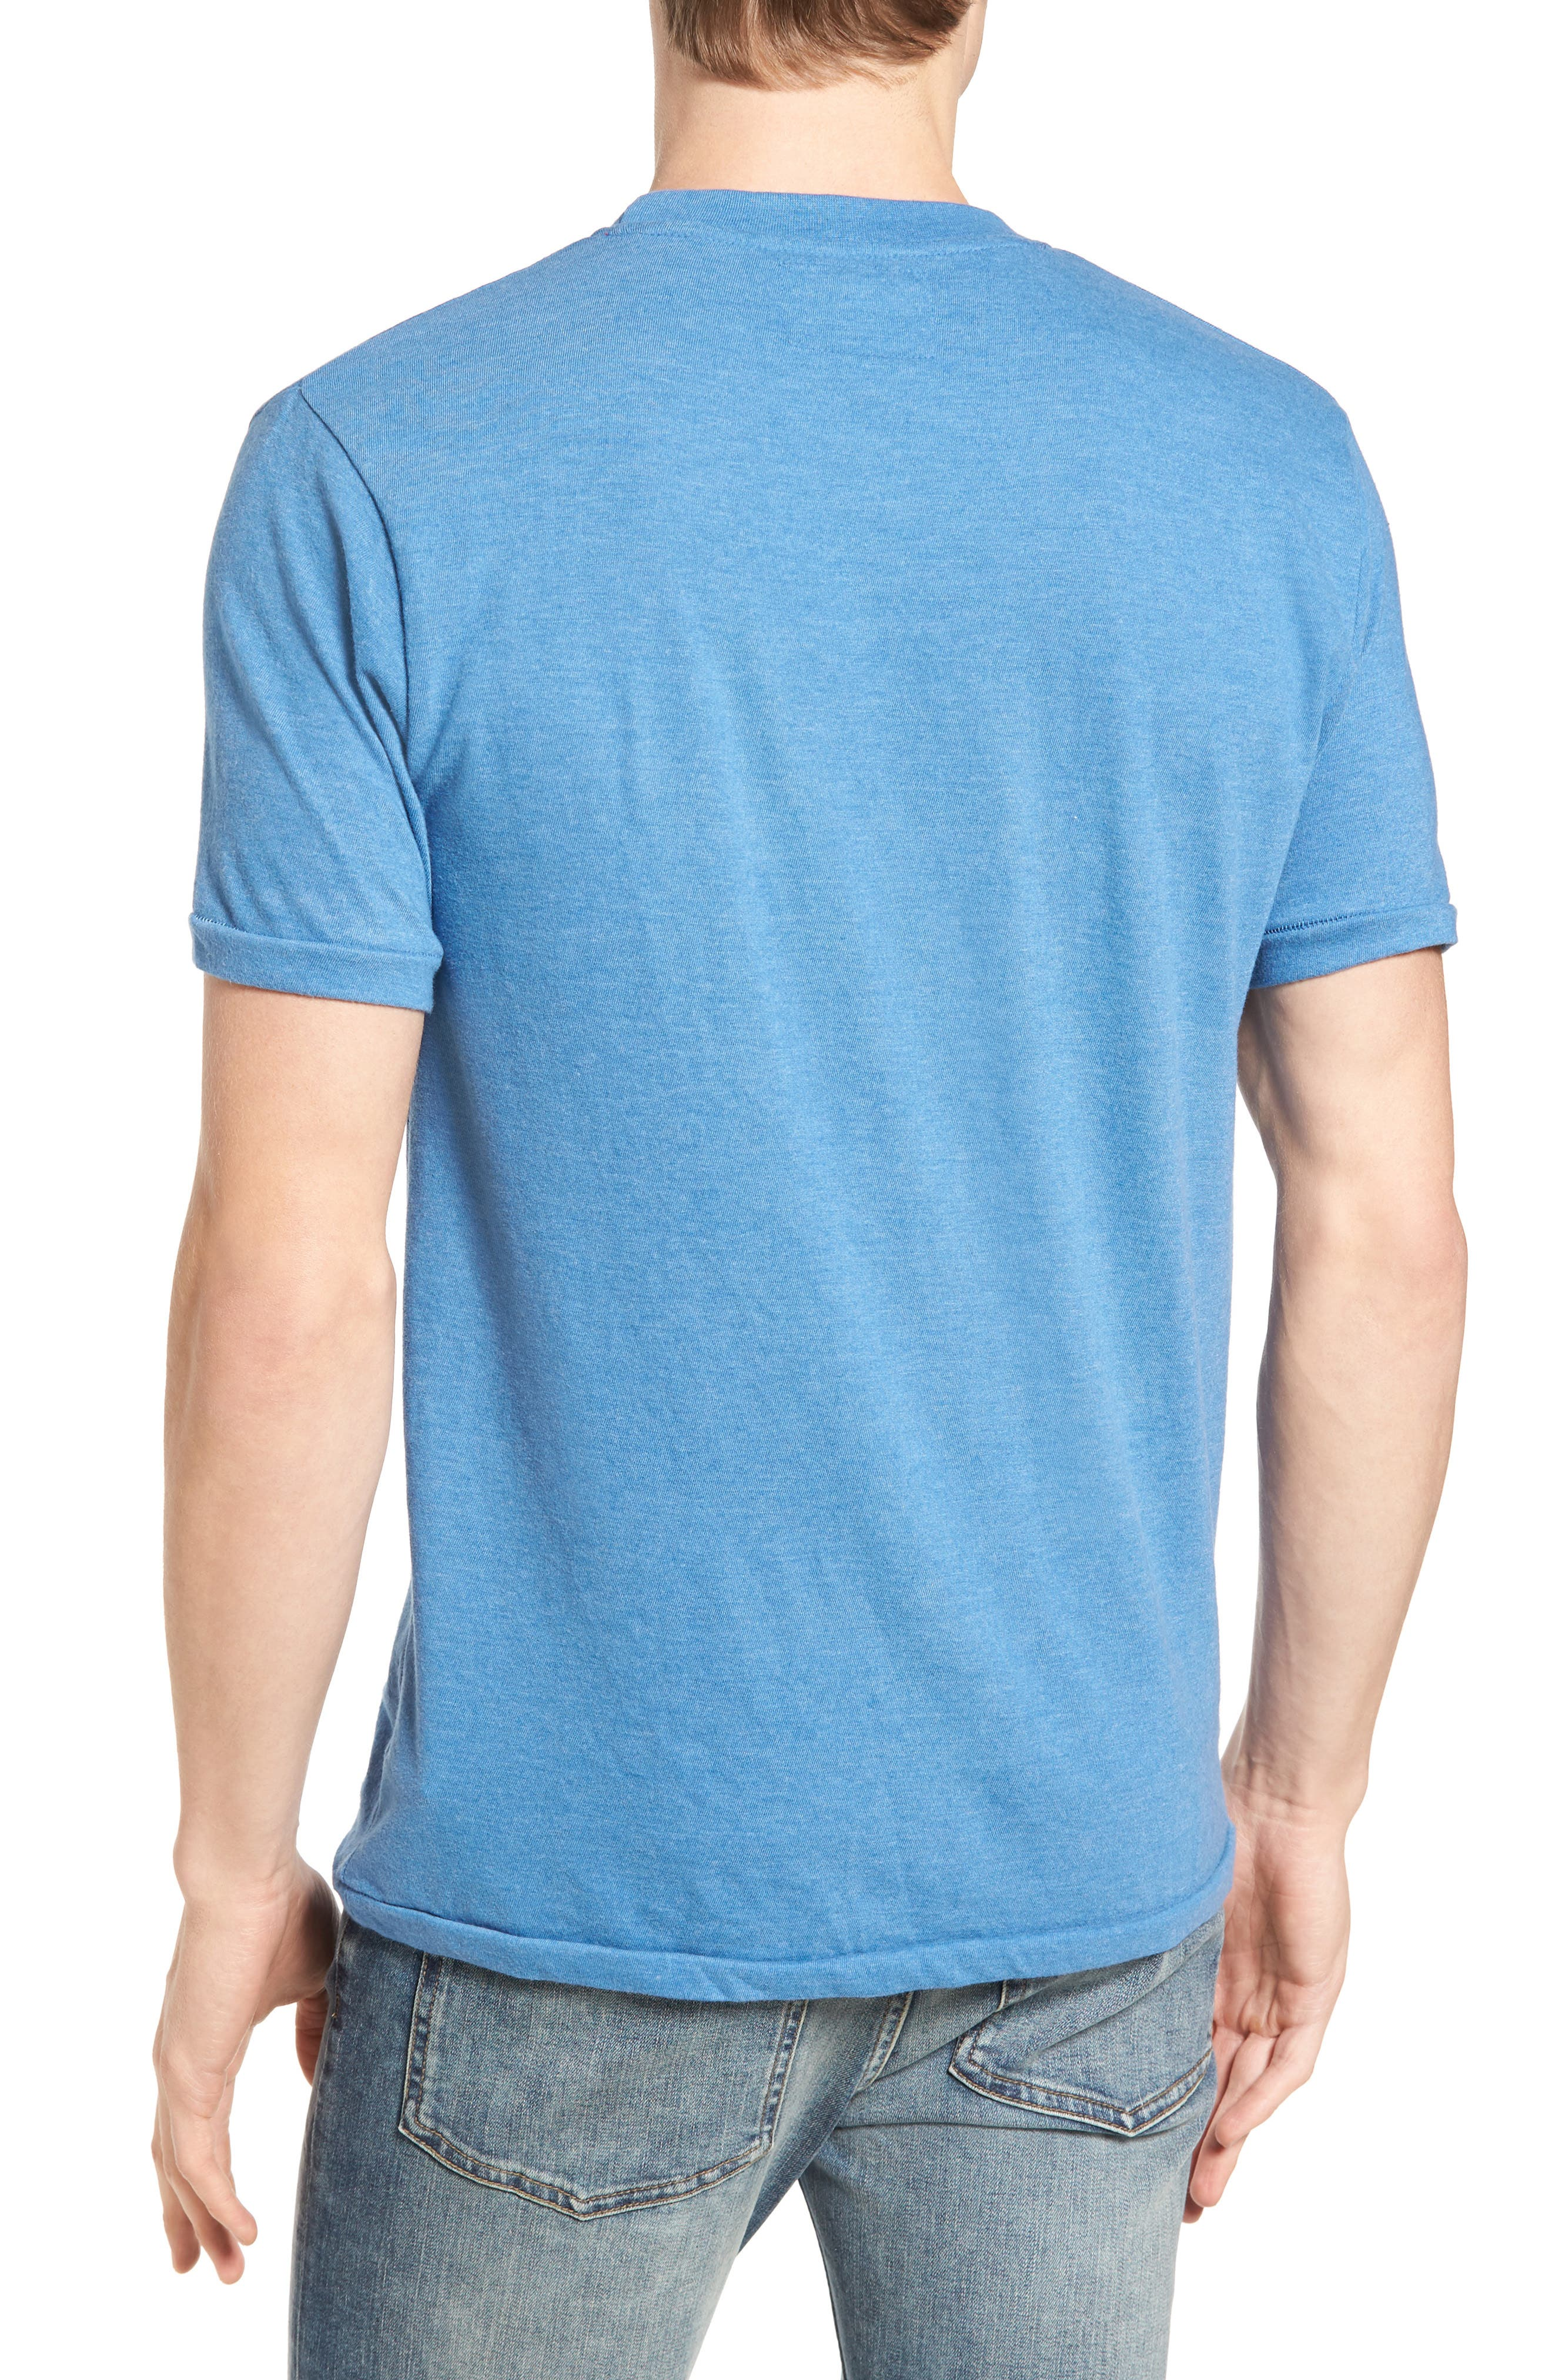 Hillwood Texas Rangers T-Shirt,                             Alternate thumbnail 2, color,                             450